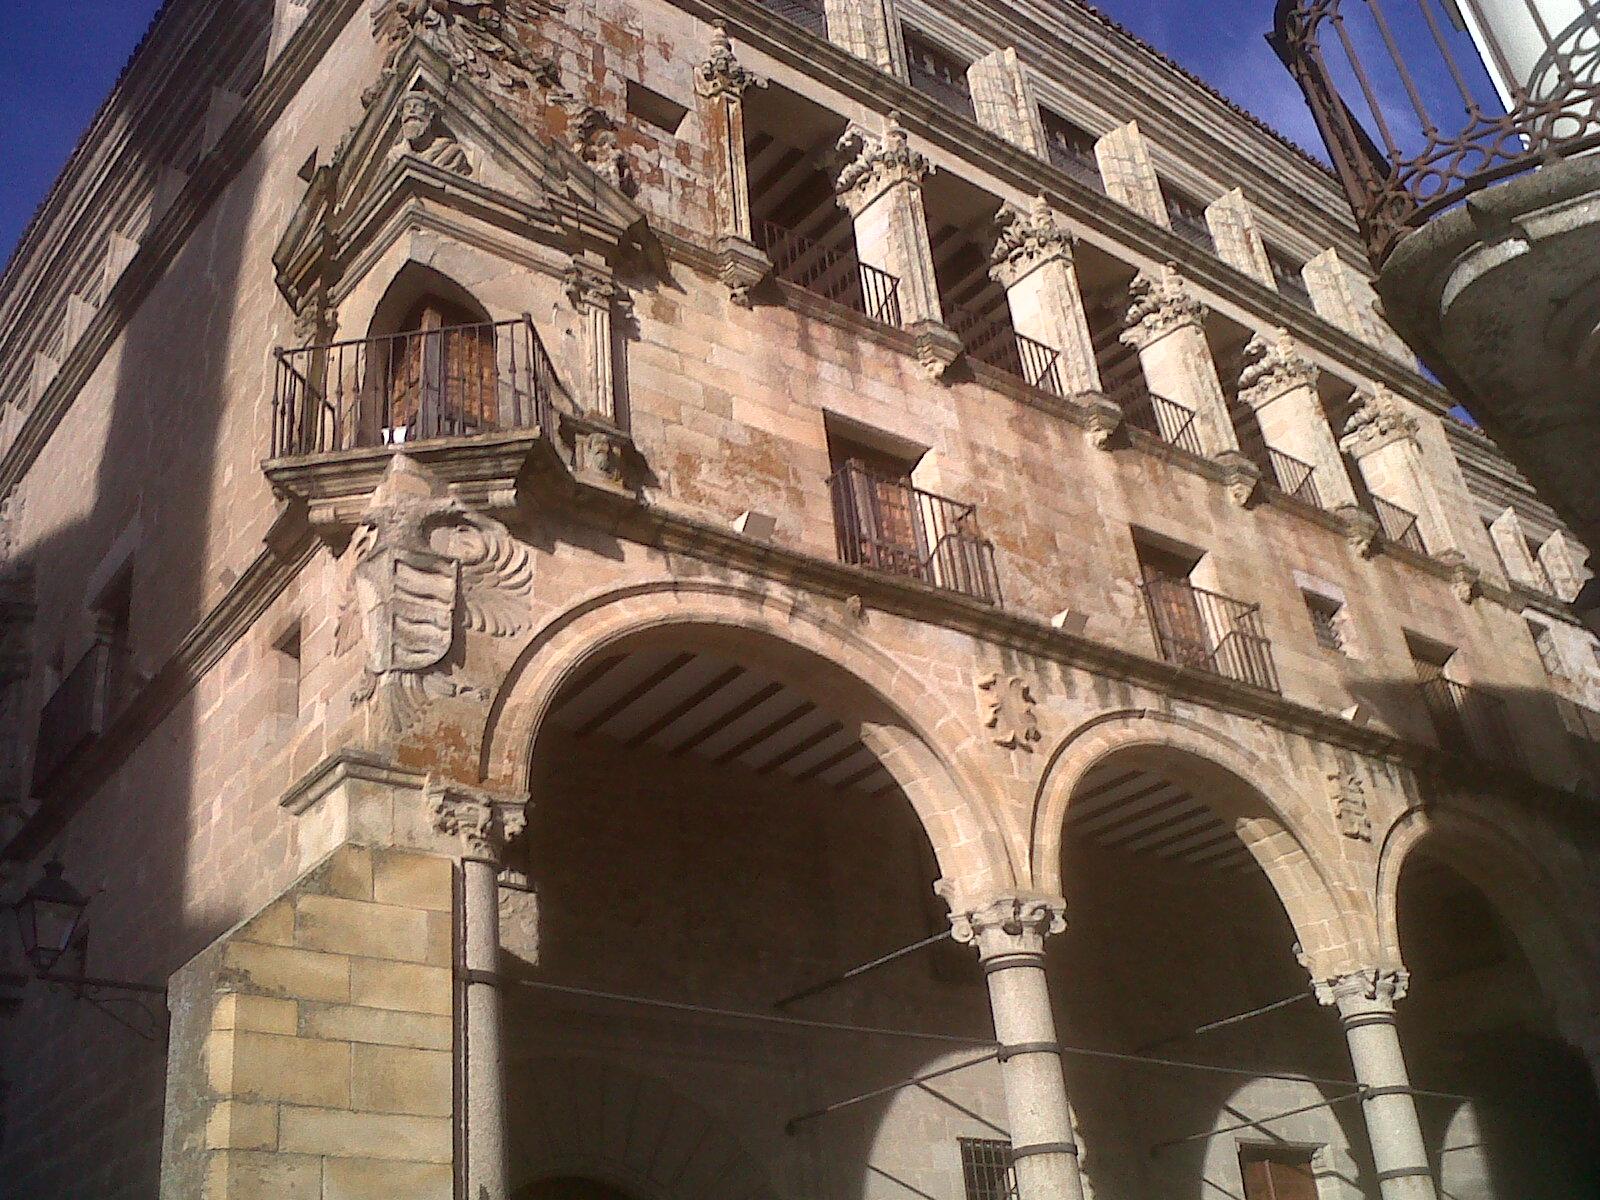 trujillo-pl-mayor-dukes-san-carlos-palace-carvajal-vargas-sep12